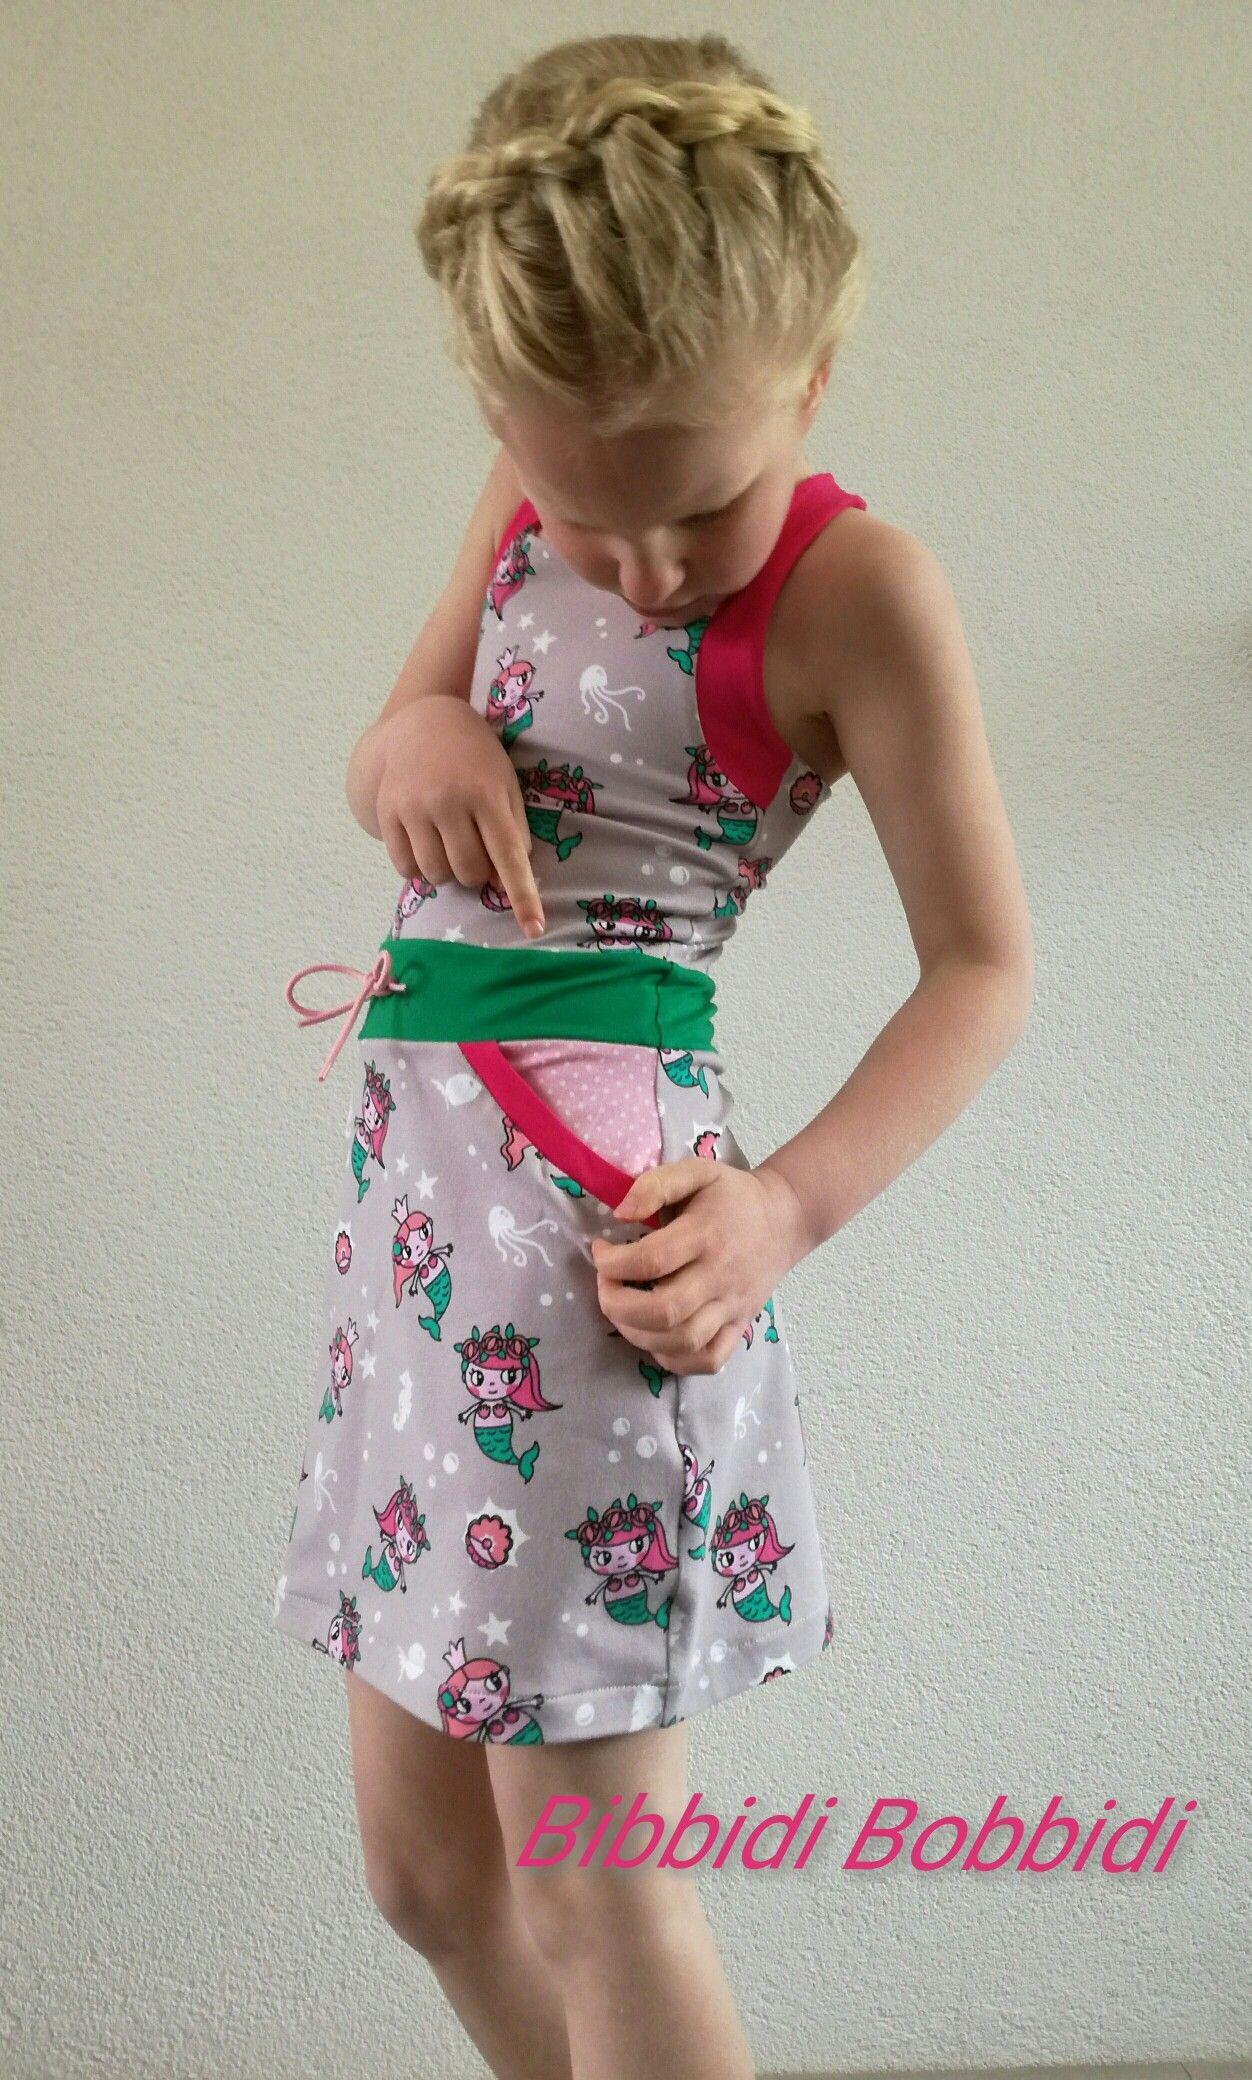 Mantica Dress from Sofilantjes. Made by Bibbidi Bobbidi